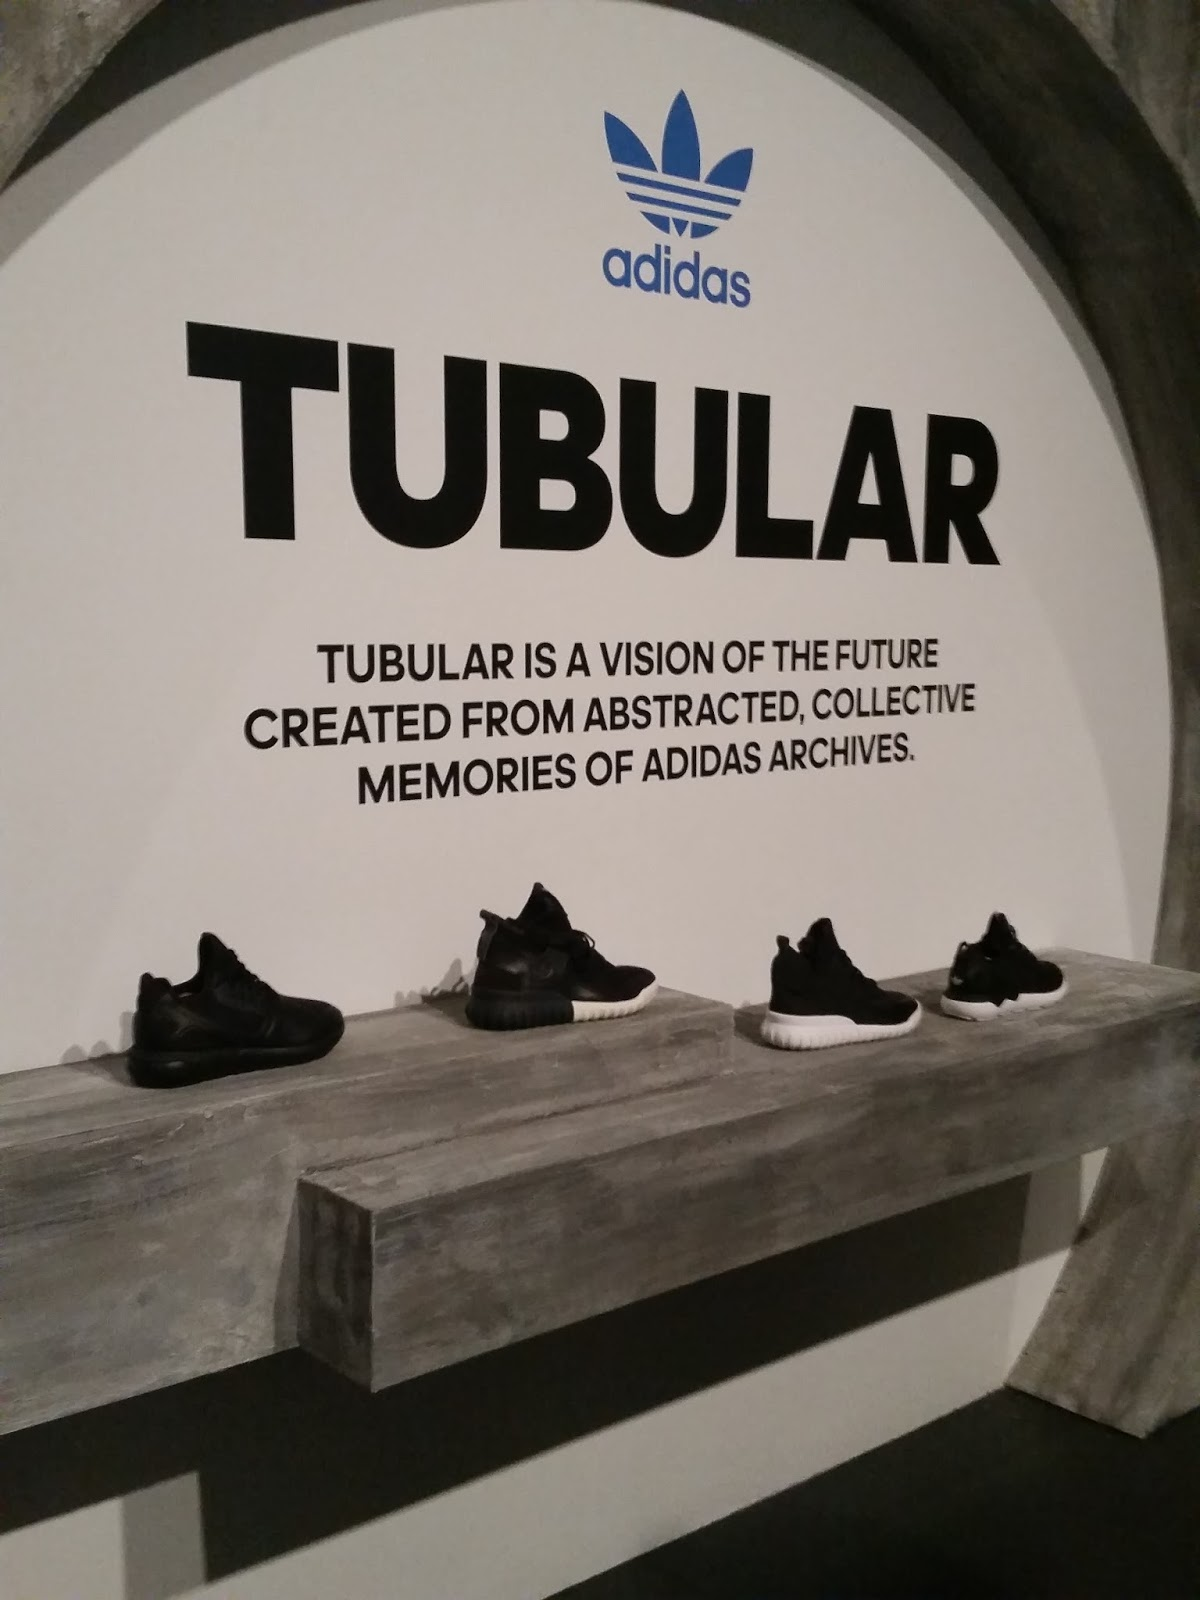 6067032ad2a5 ADIDAS Originals TUBULAR Pop-Up Gallery